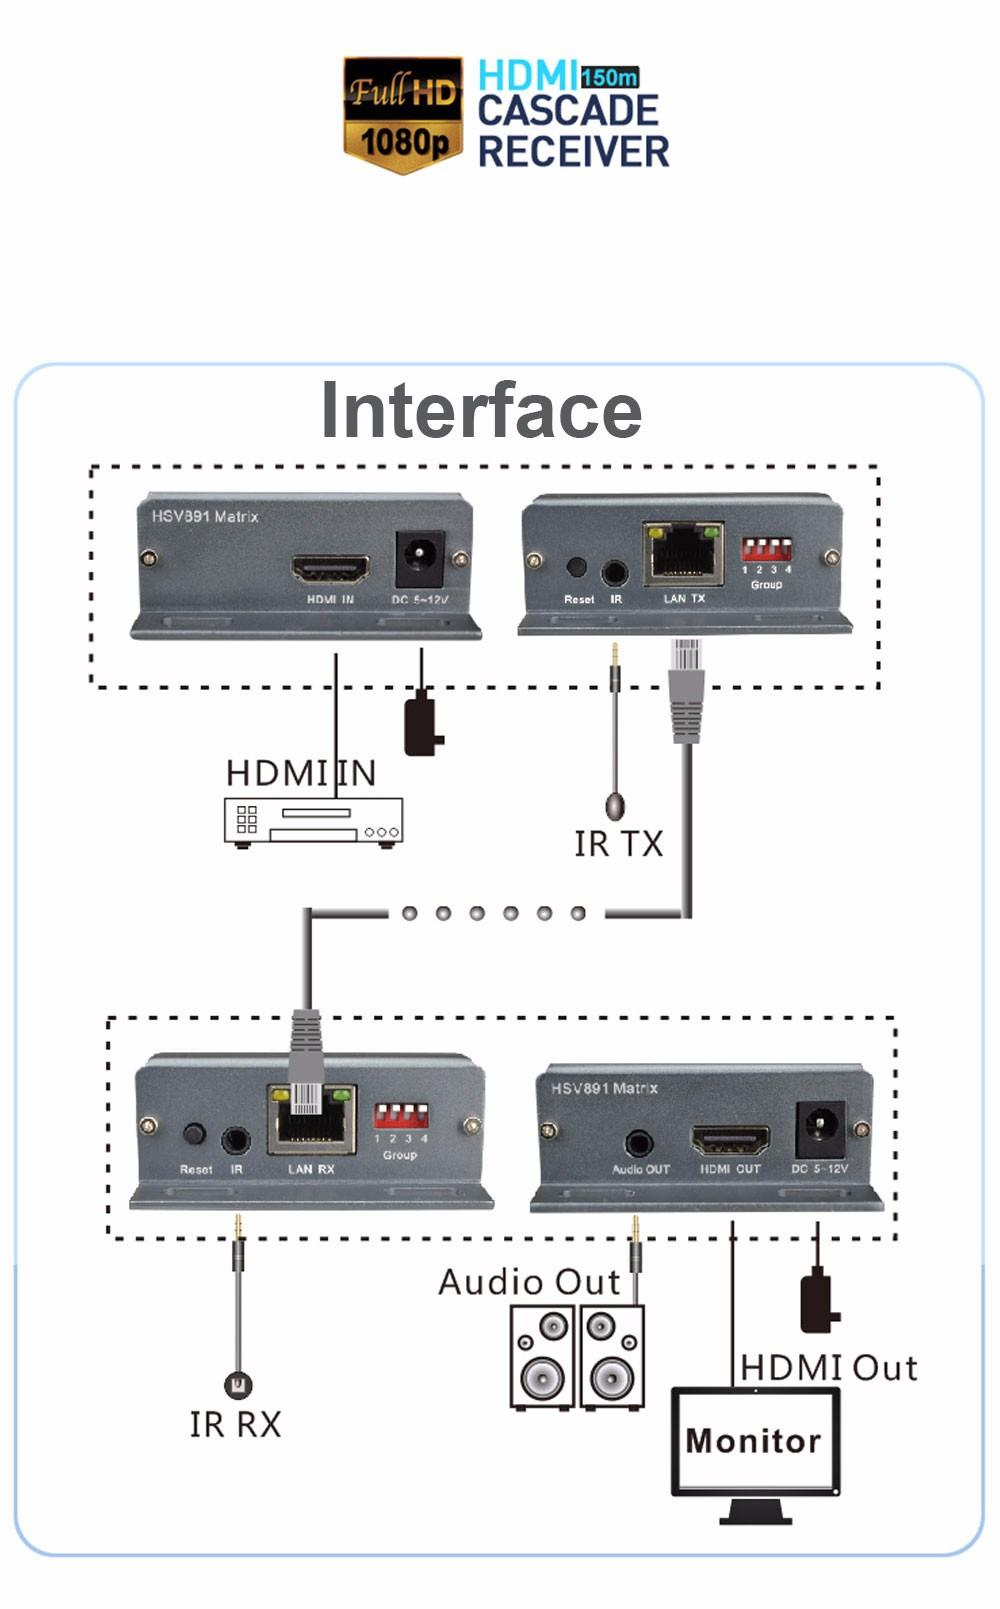 HDMI-EXTENDER-HSV891Matrix_11